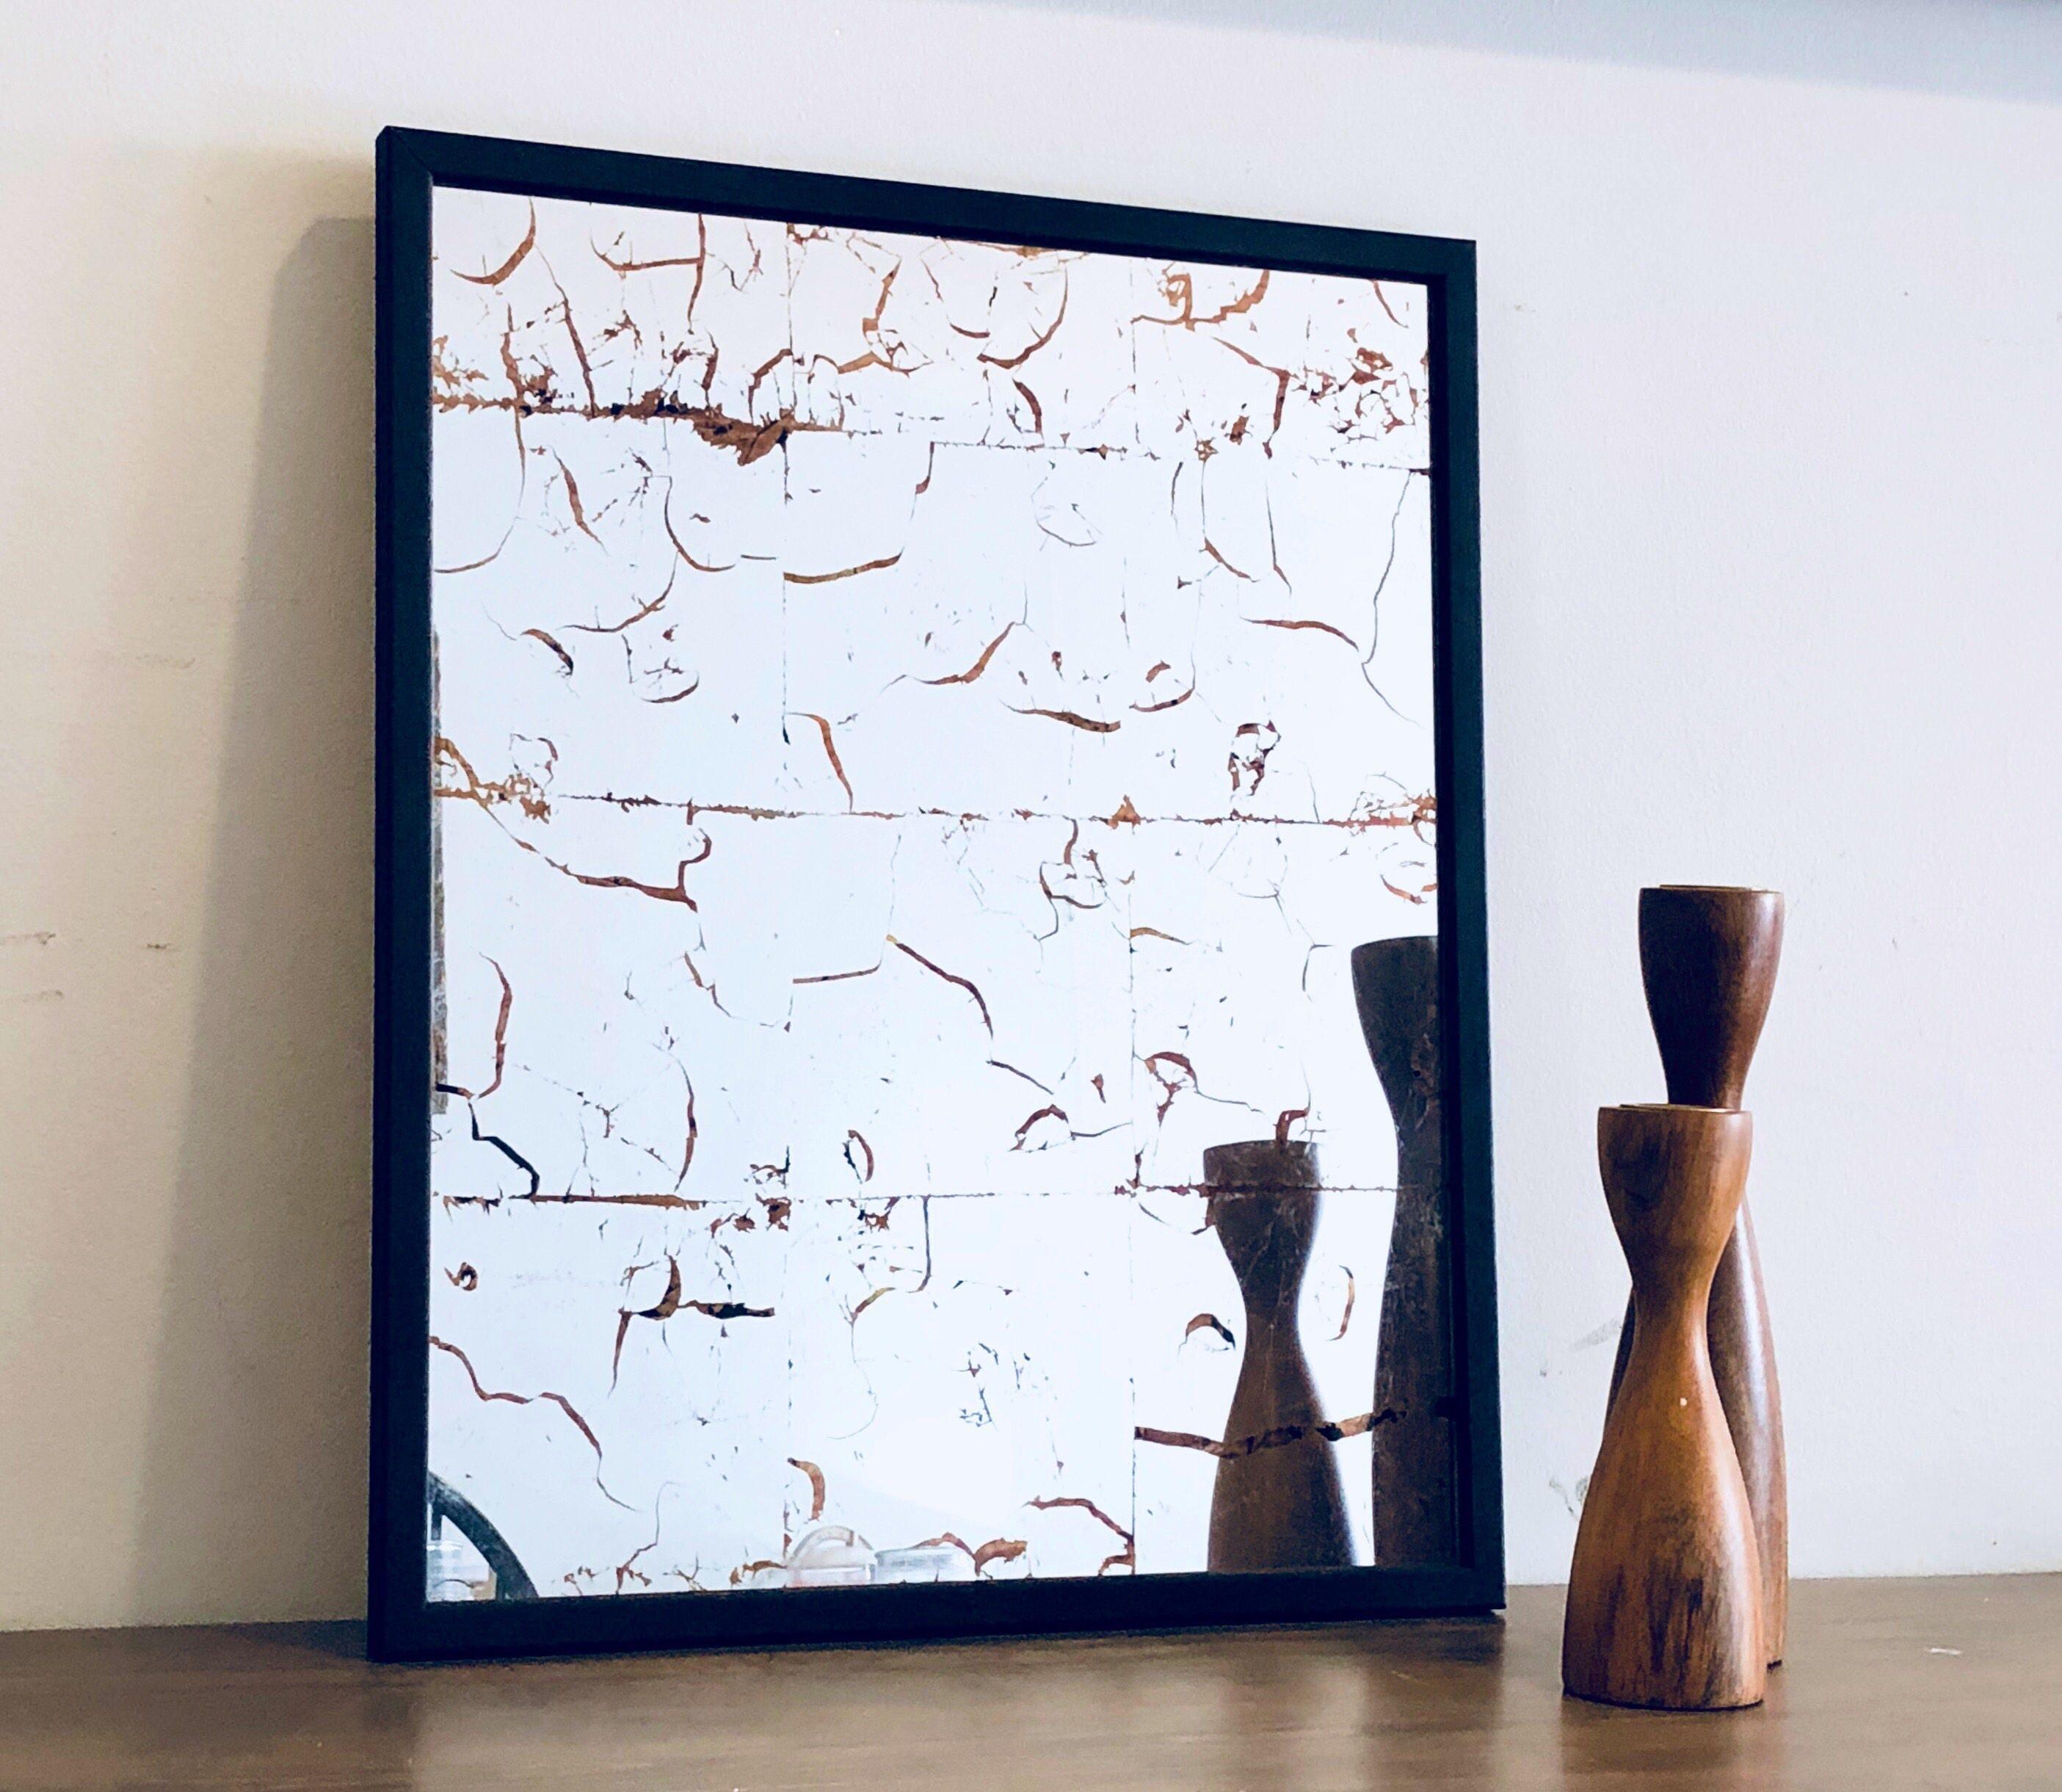 Wandspiegel beunruhigt Spiegel Verre Eglomise vergoldeter | Etsy